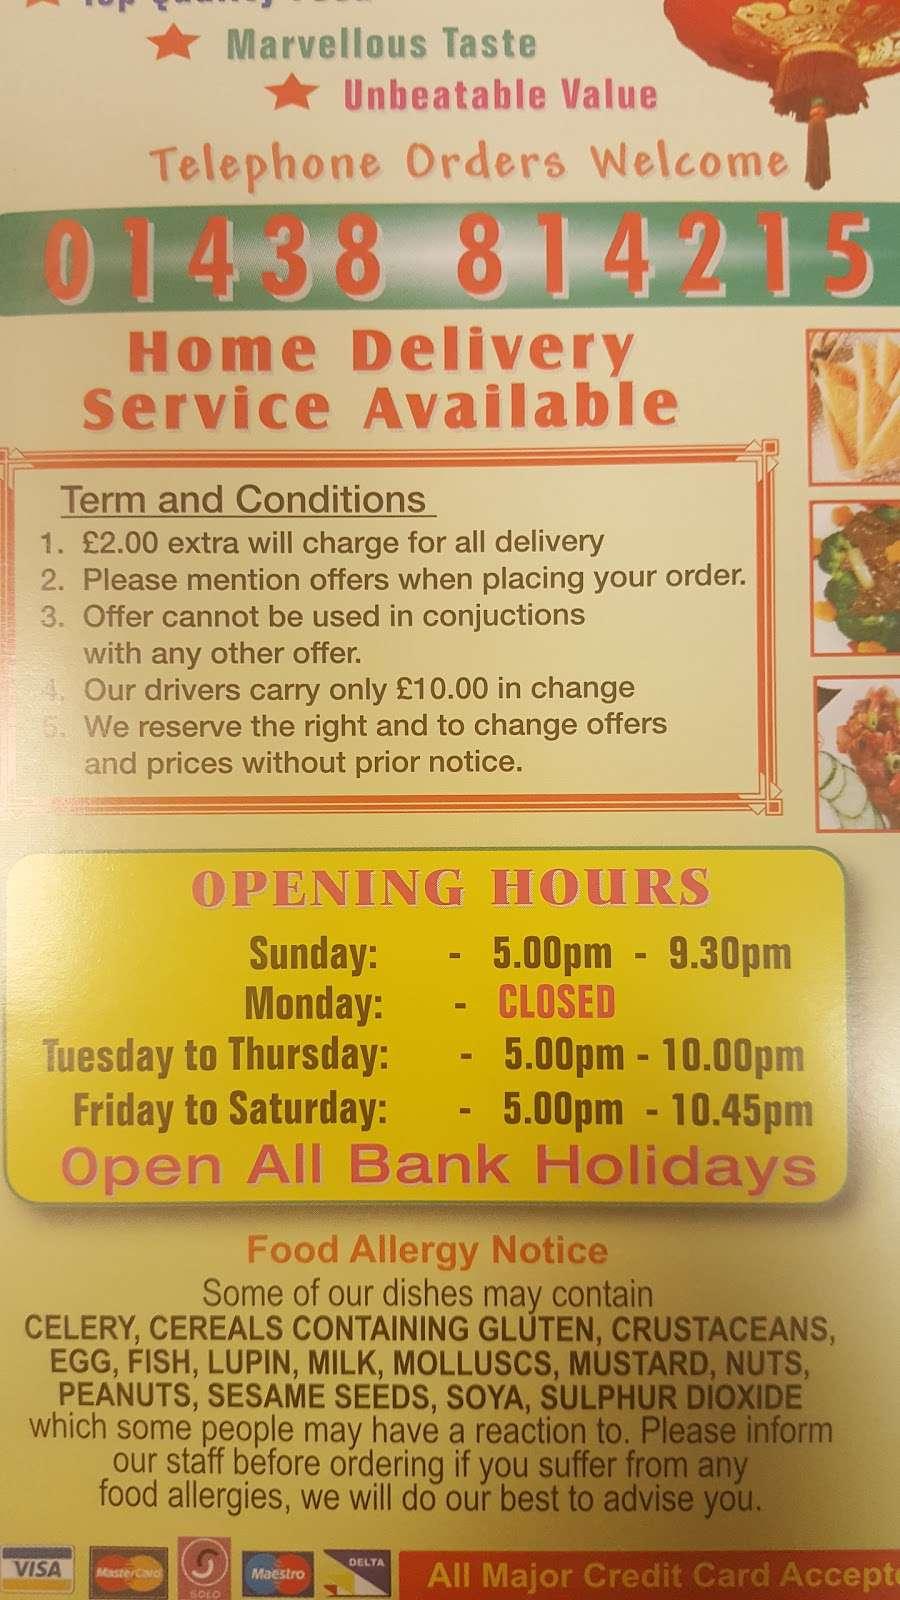 Stevenage Fish Bar - meal takeaway  | Photo 3 of 3 | Address: 5 Kenilworth Cl, Bragbury End, Stevenage SG2 8TB, UK | Phone: 01438 814215